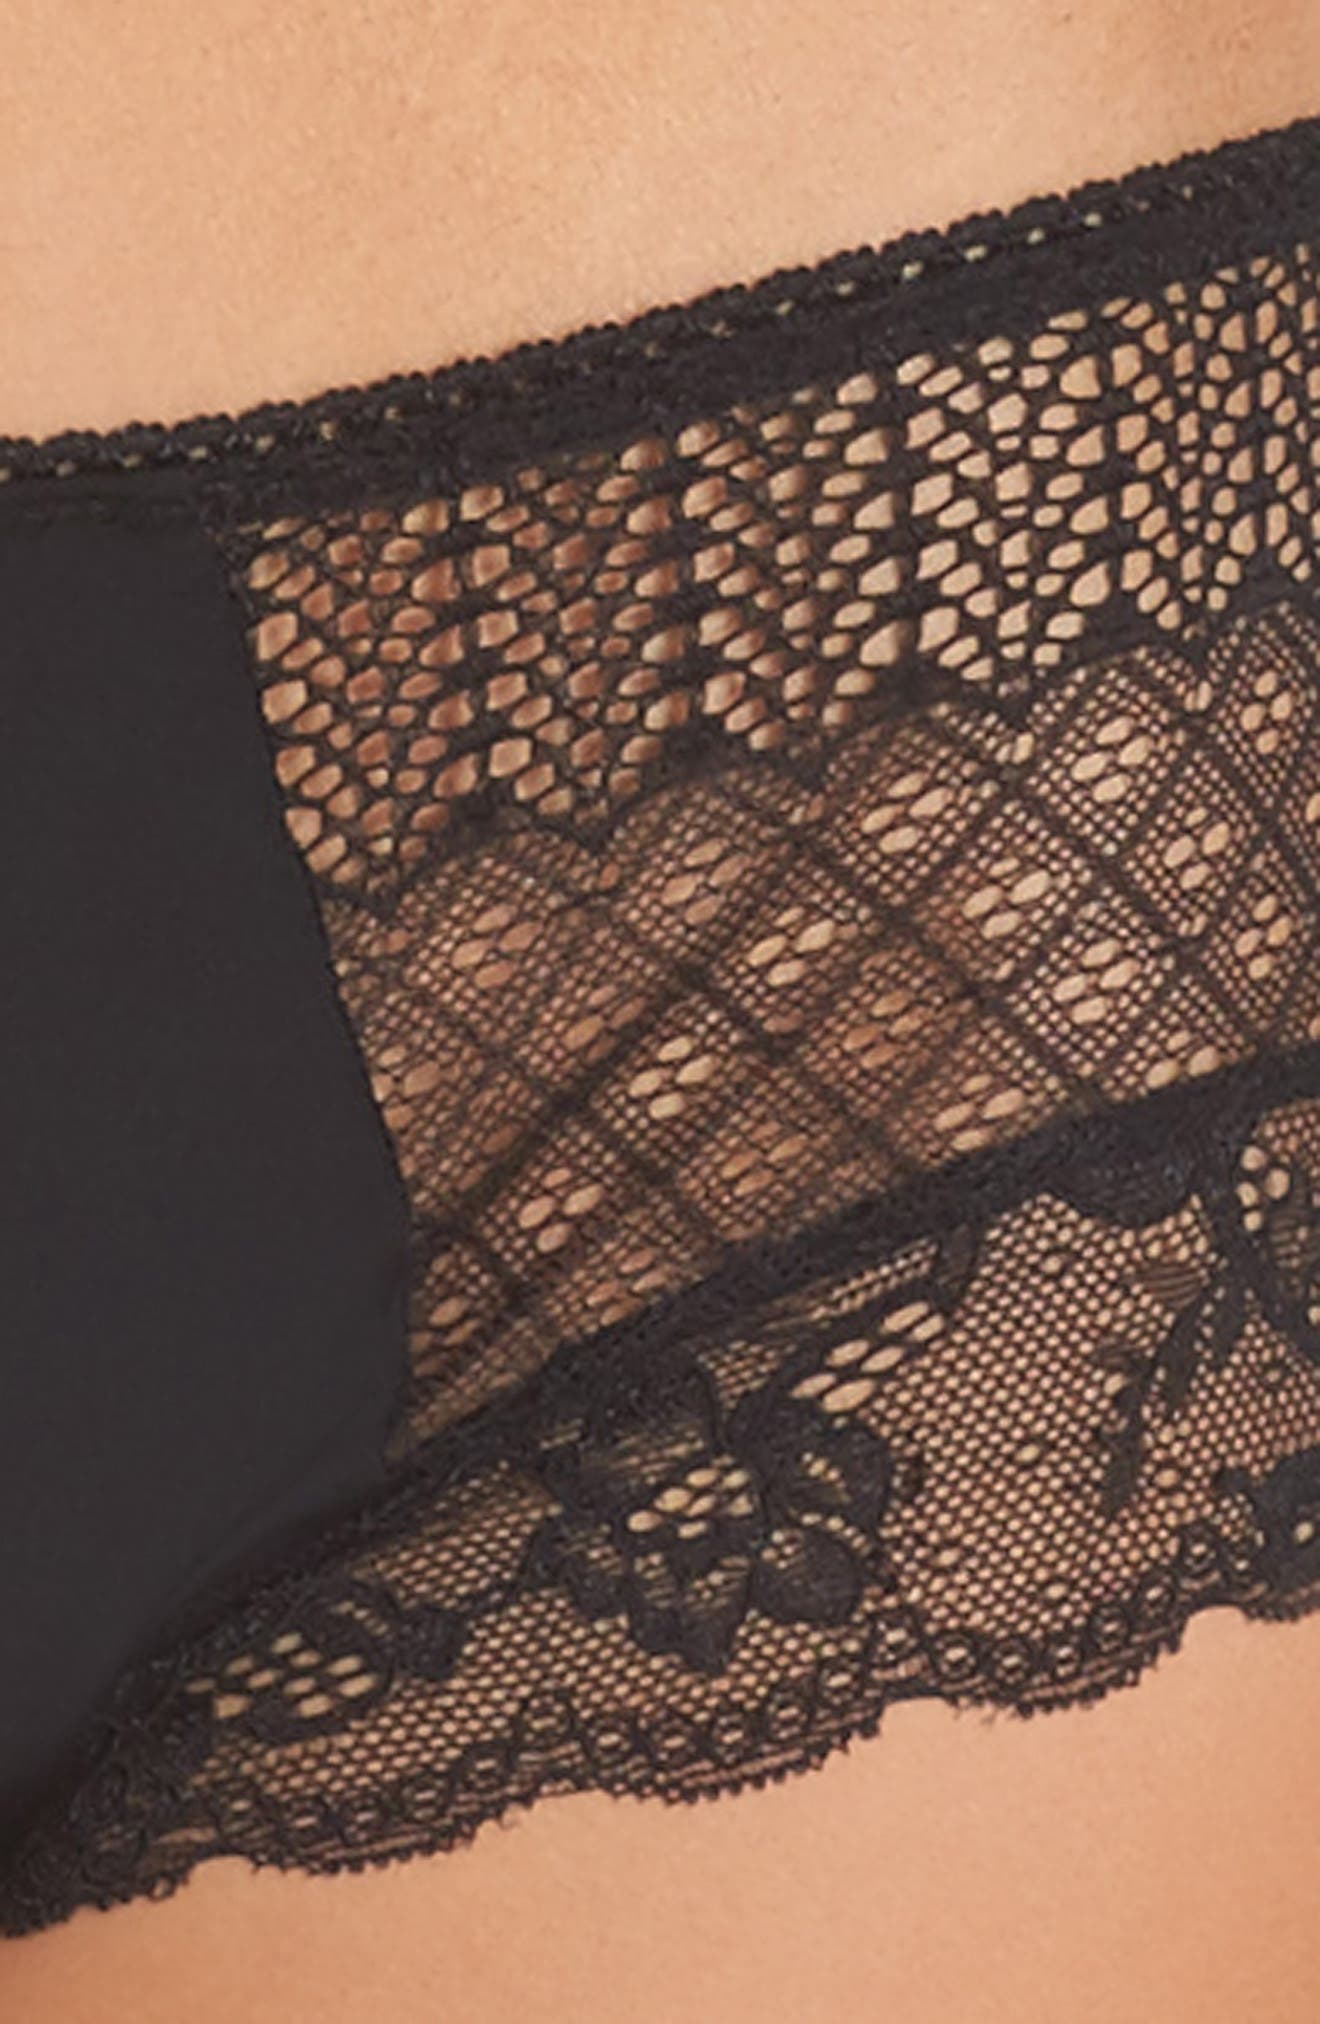 Honeydew Microfiber & Lace Hipster Panties,                             Alternate thumbnail 10, color,